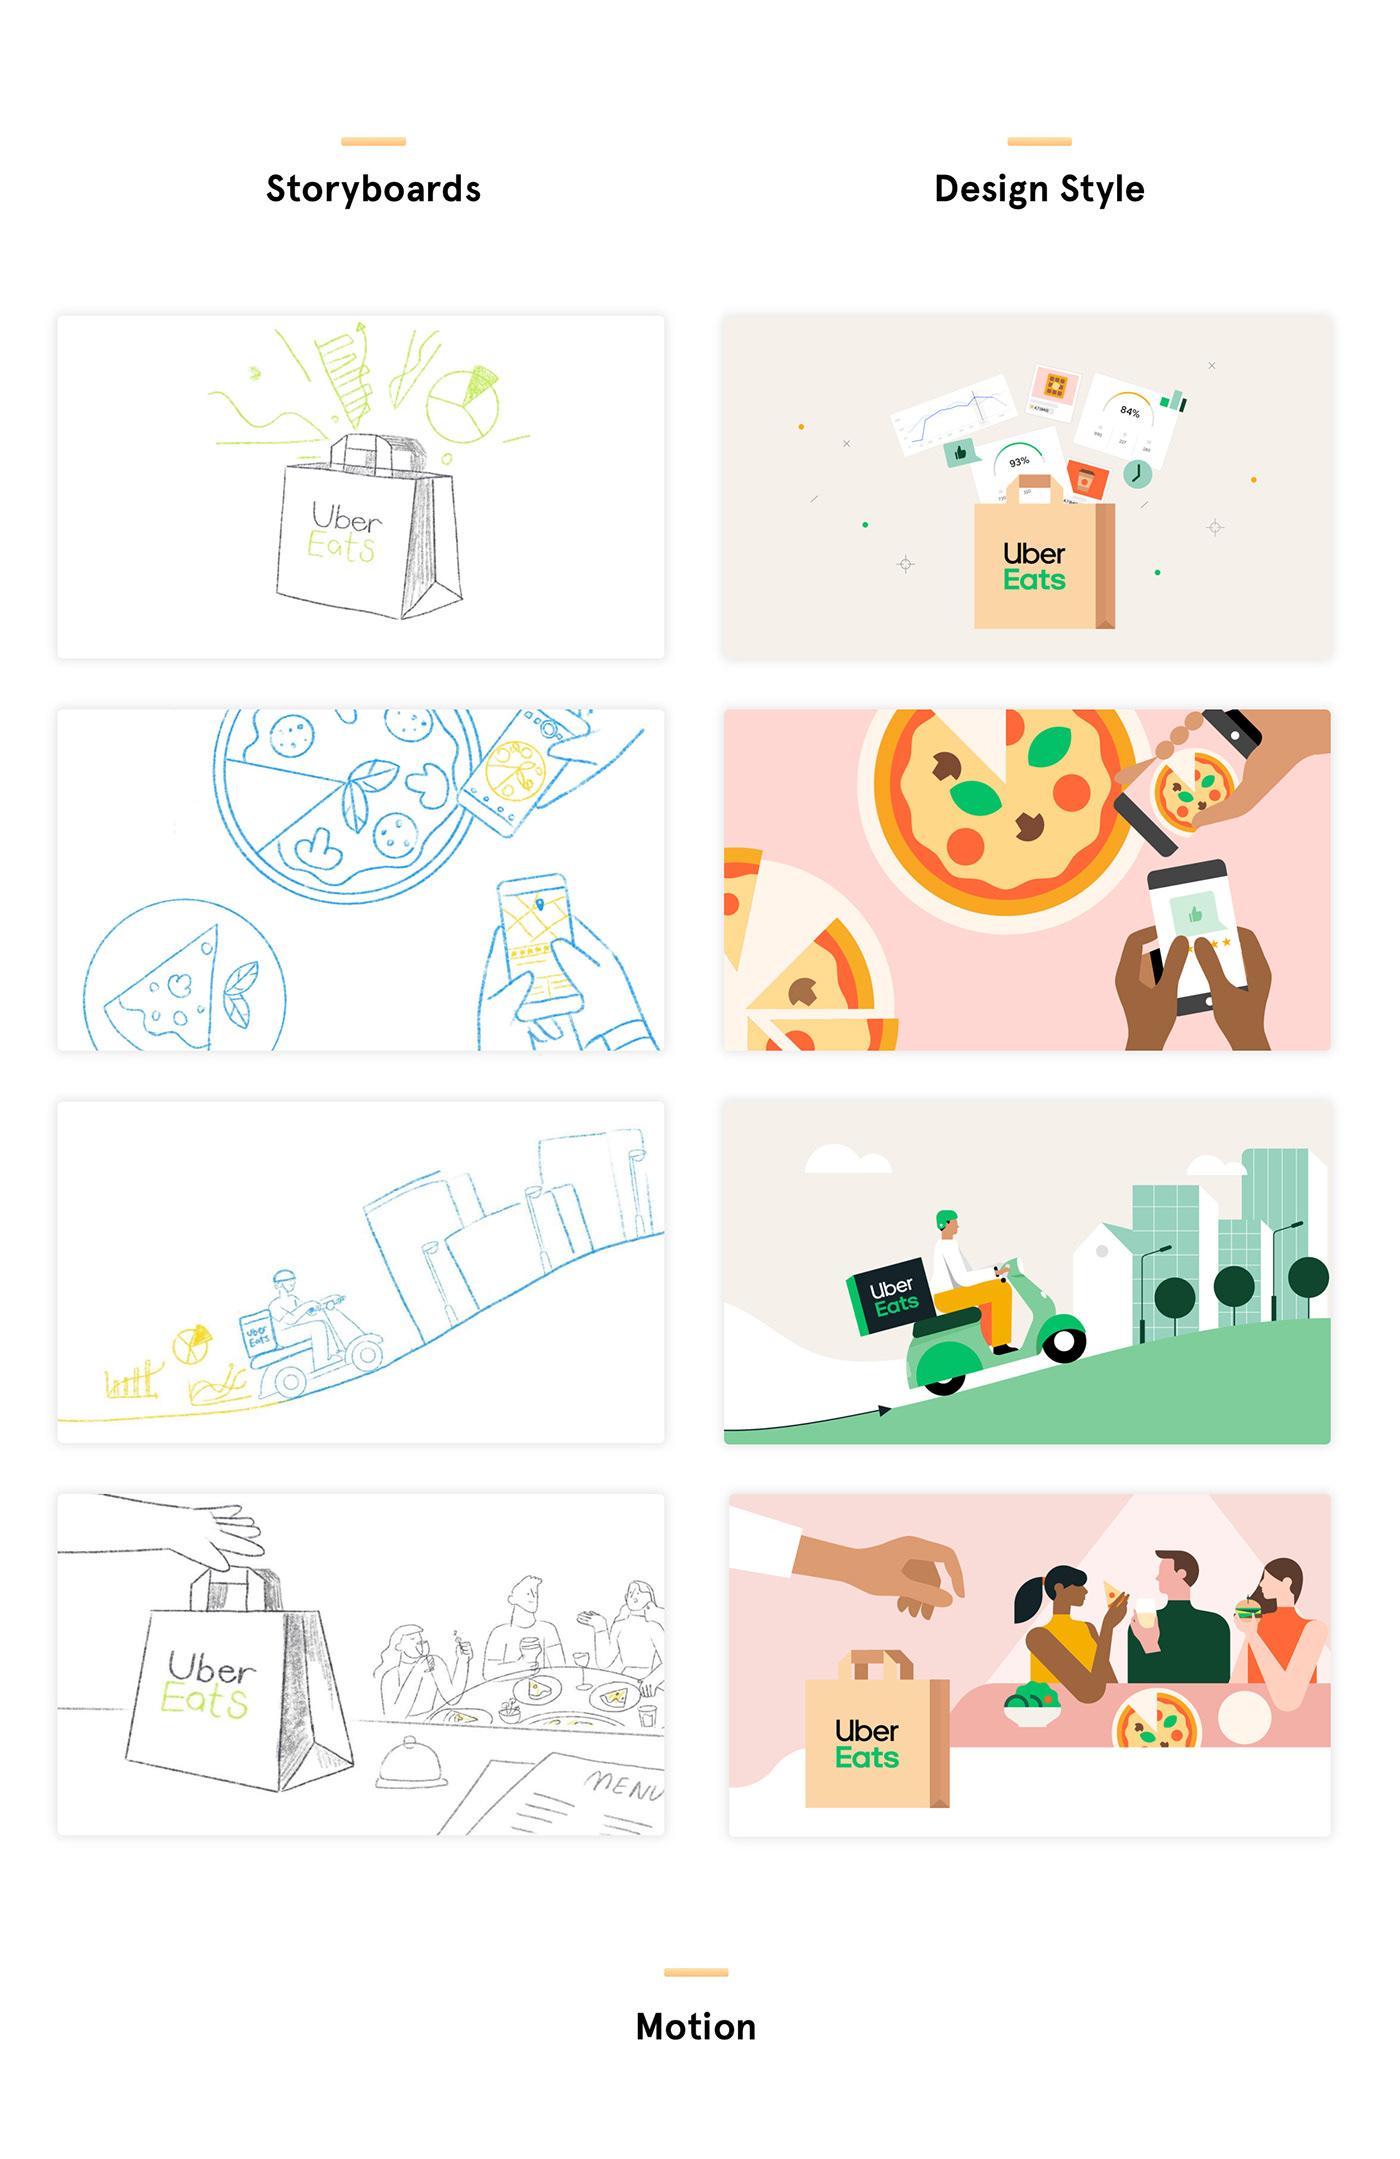 animation  explainer video Character Character design  motion Technology 2D branding  ILLUSTRATION  design